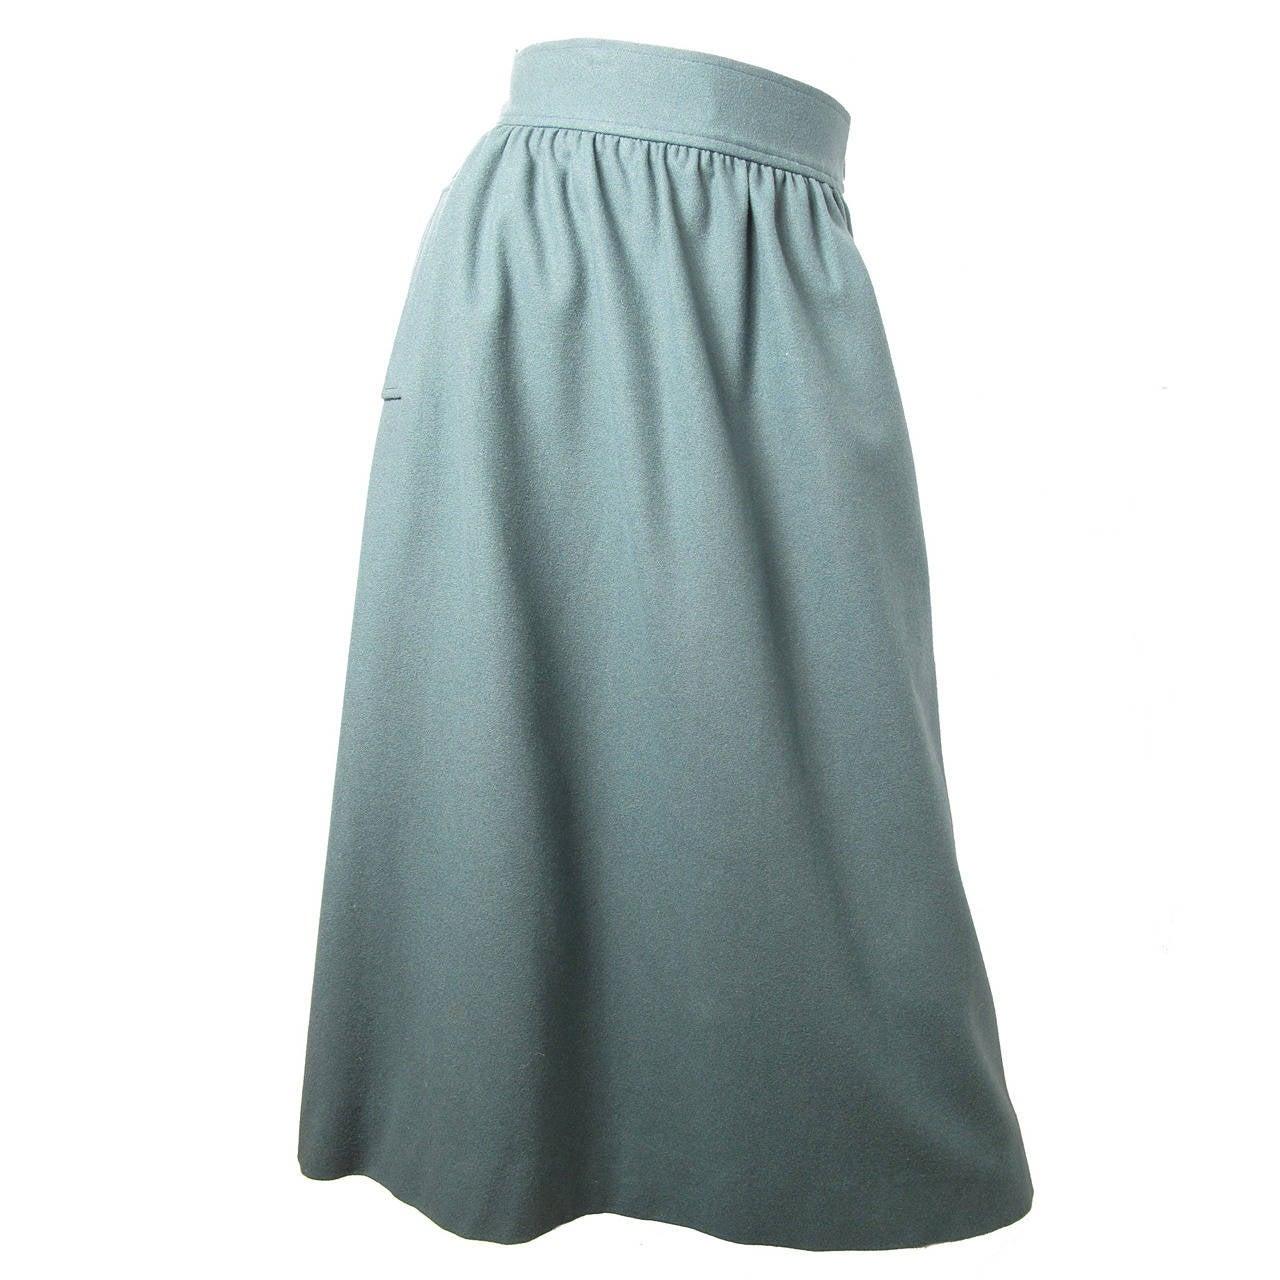 23e06aab1812 Yves Saint Laurent Rive Gauche Blue Skirt with Pockets at 1stdibs